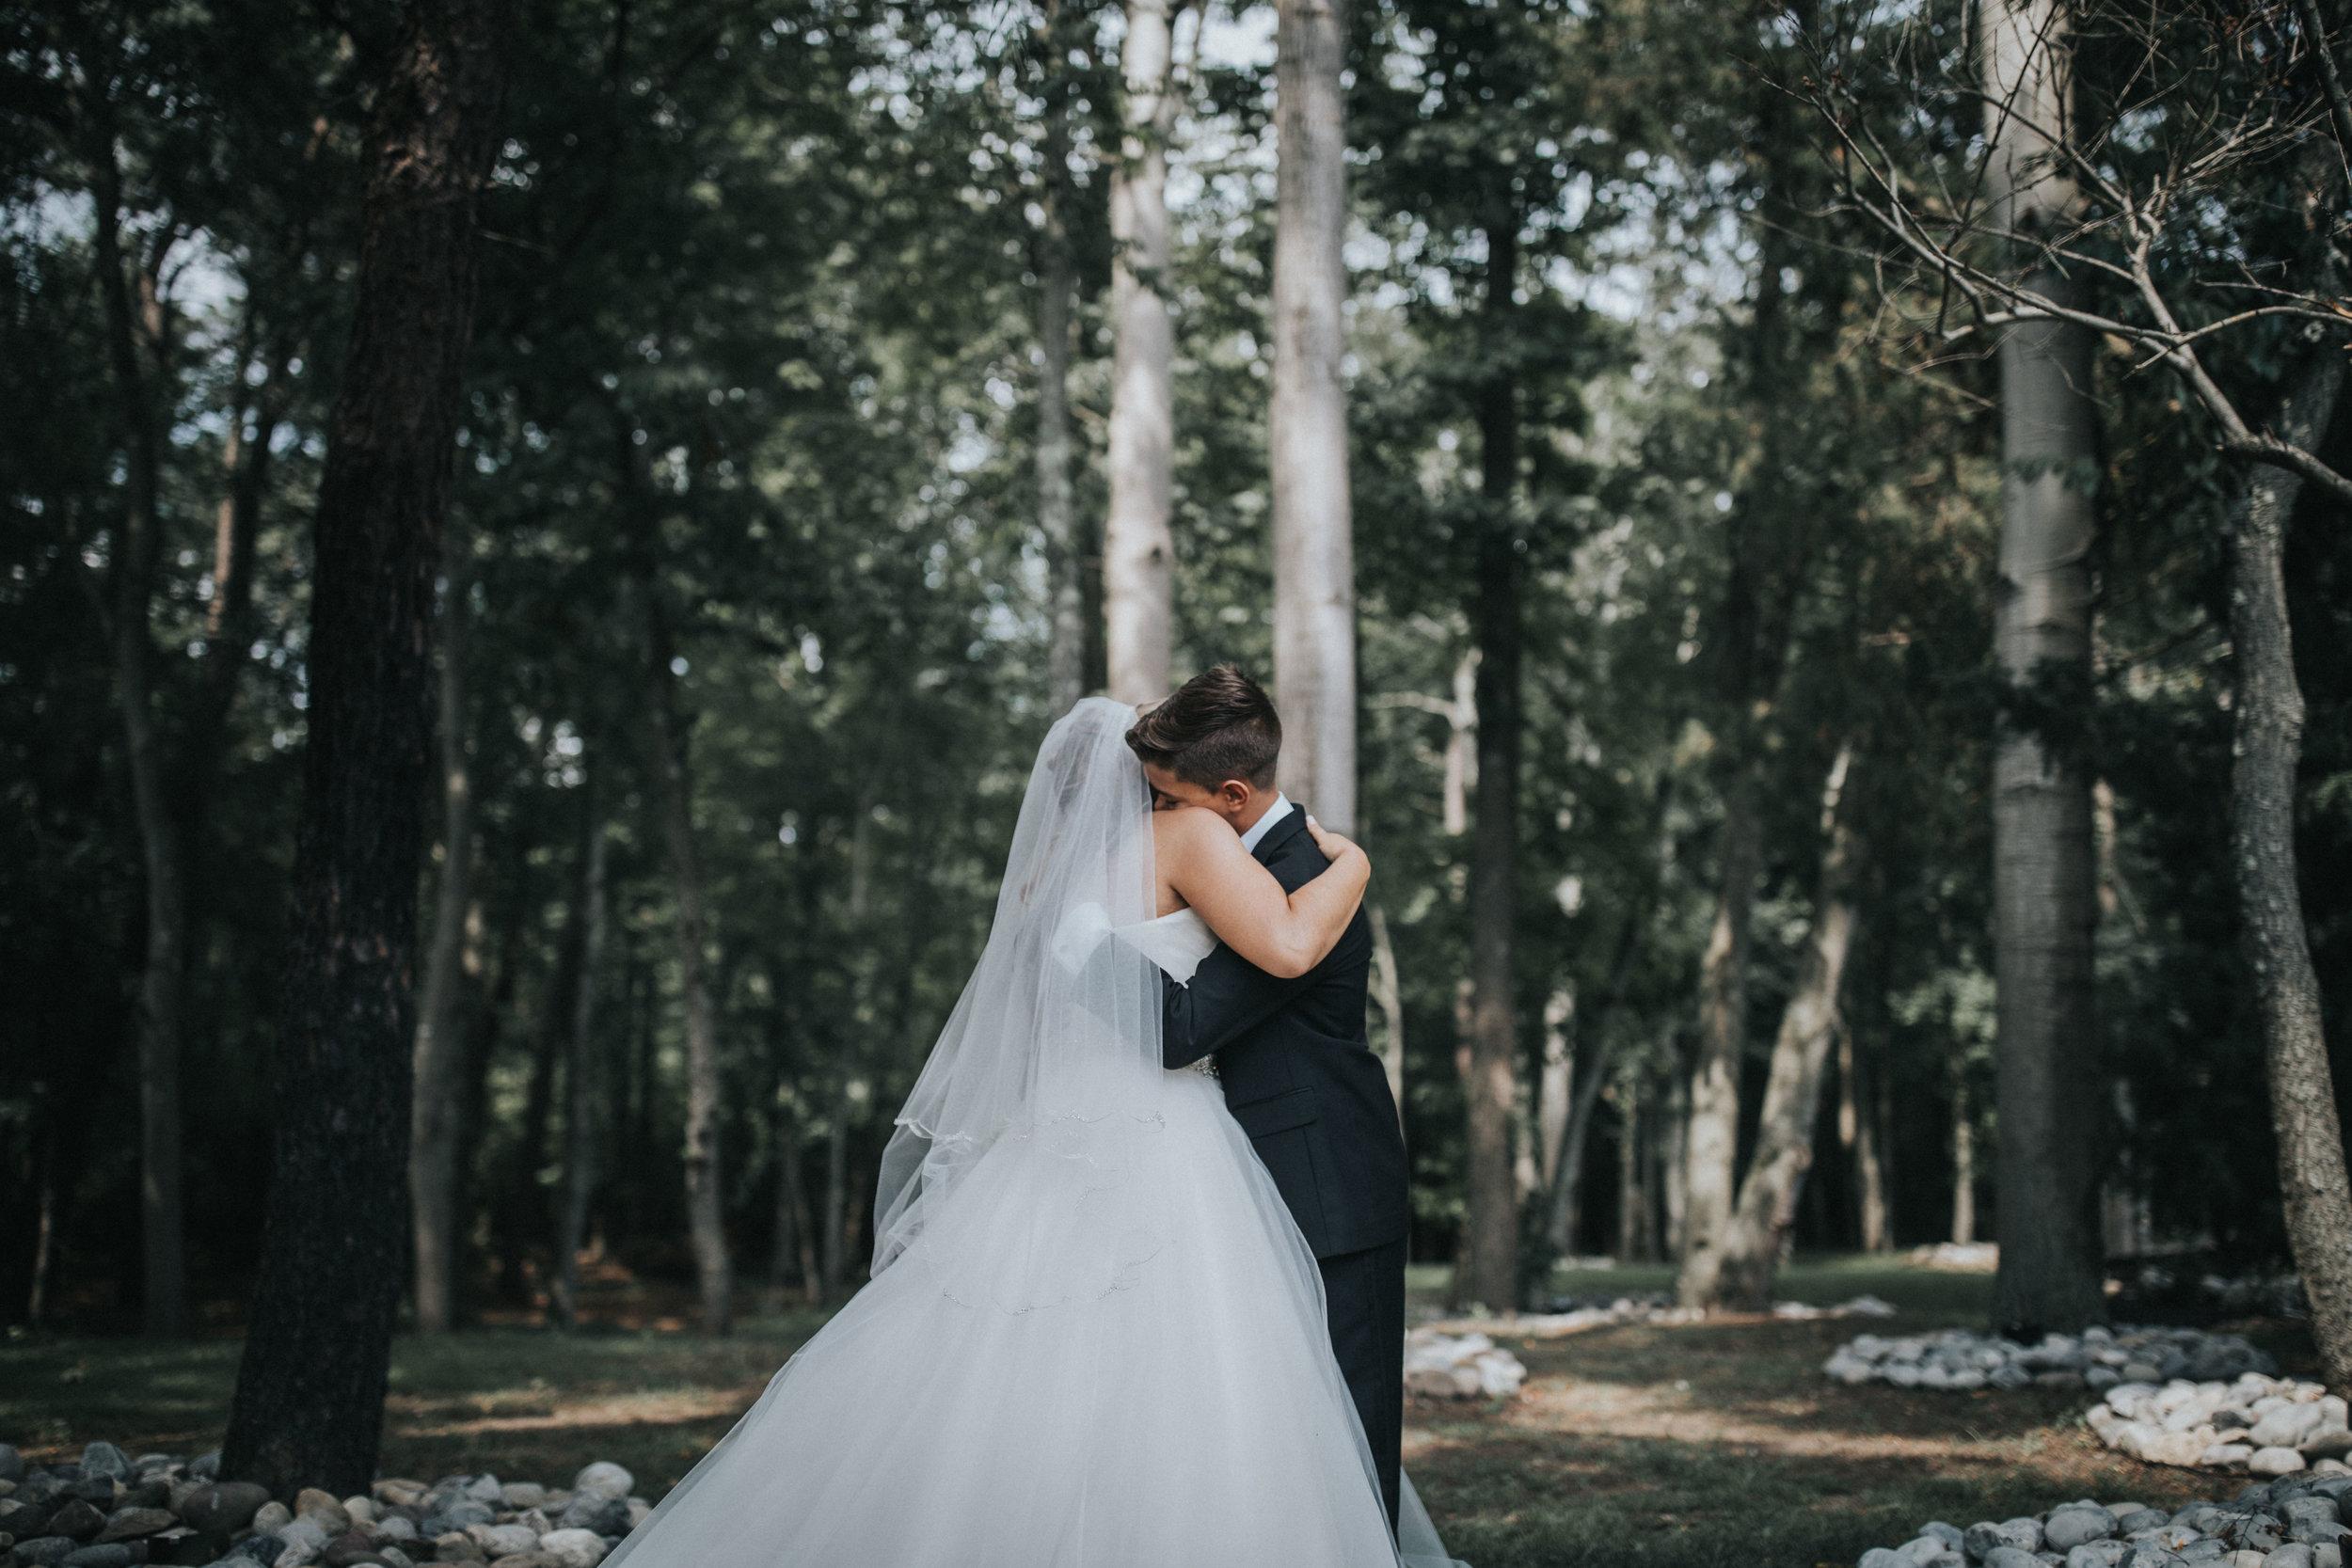 NewJersey_Wedding_Photography_Brigalias_First_Look_Tara&Pete-35.jpg